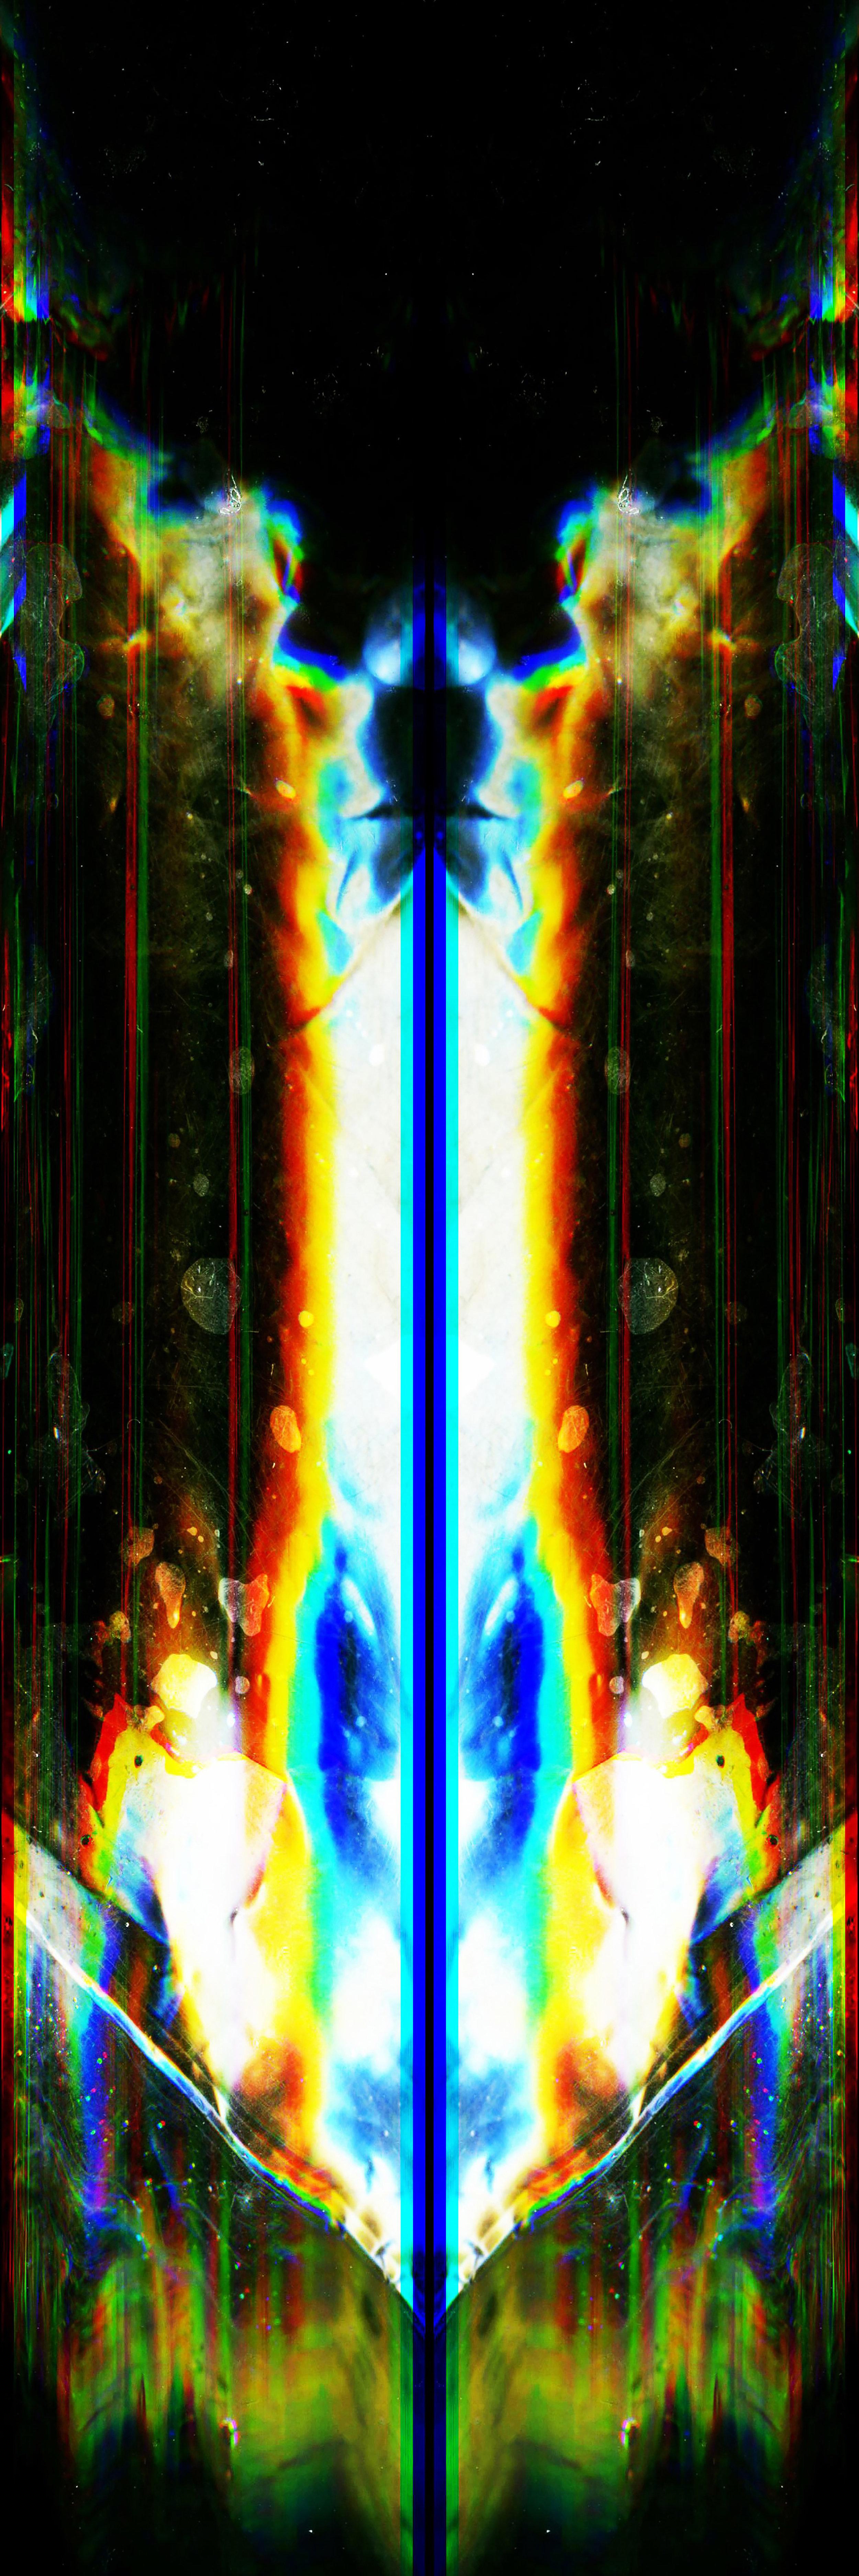 abstract-k-printready.jpg